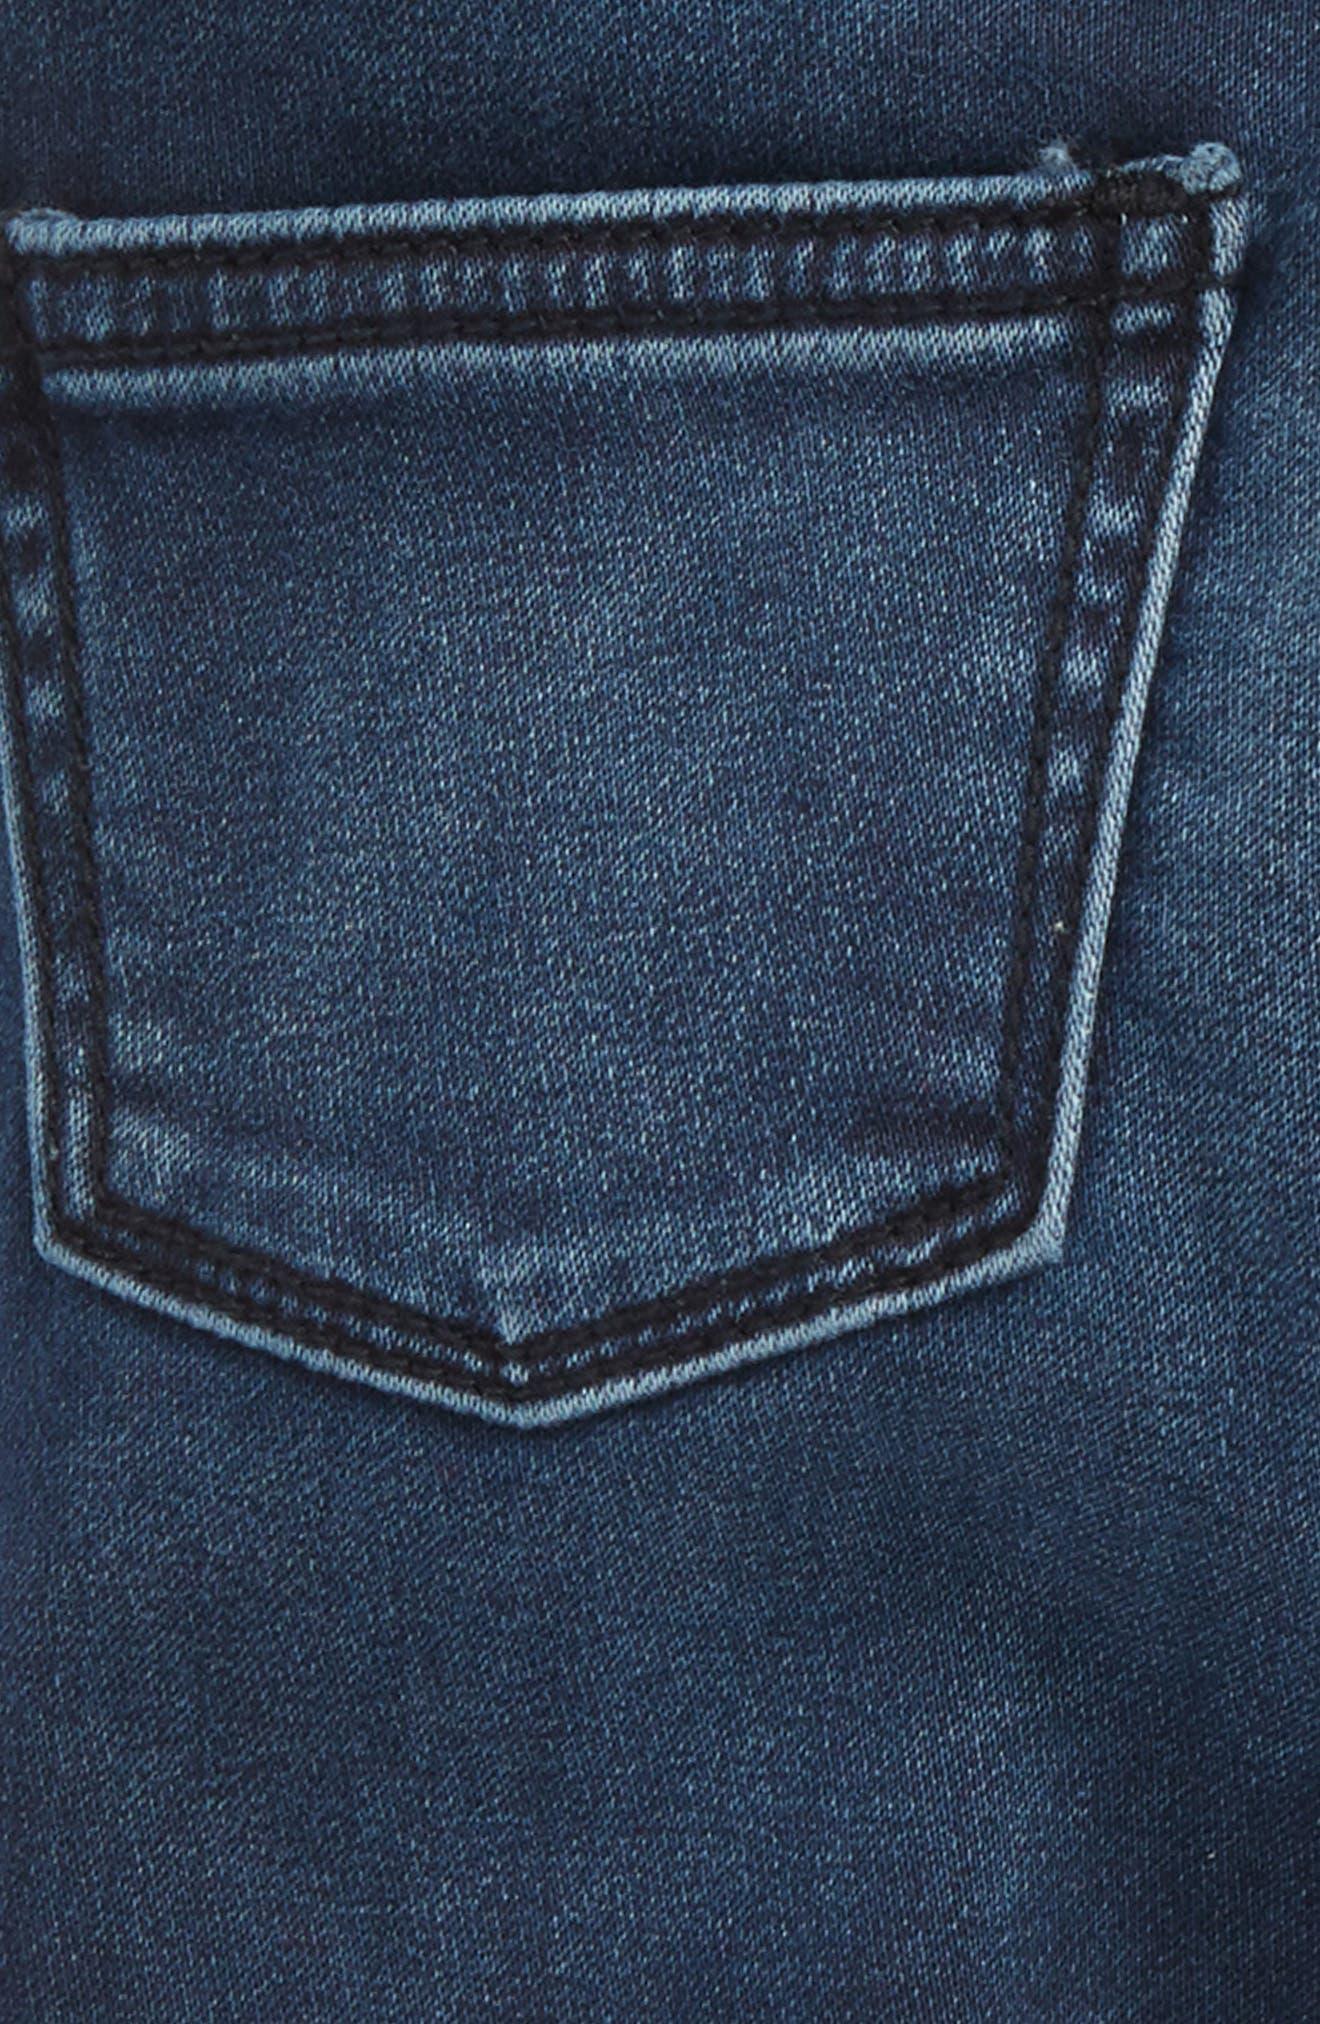 Eddy Slim Fit Jeans,                             Alternate thumbnail 3, color,                             Reserve